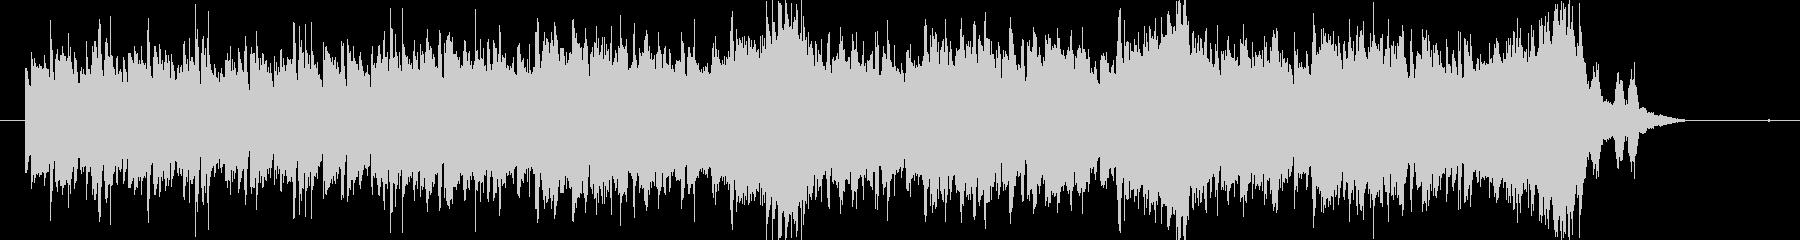 EDM,DANCE系声はWakeUpのみの未再生の波形